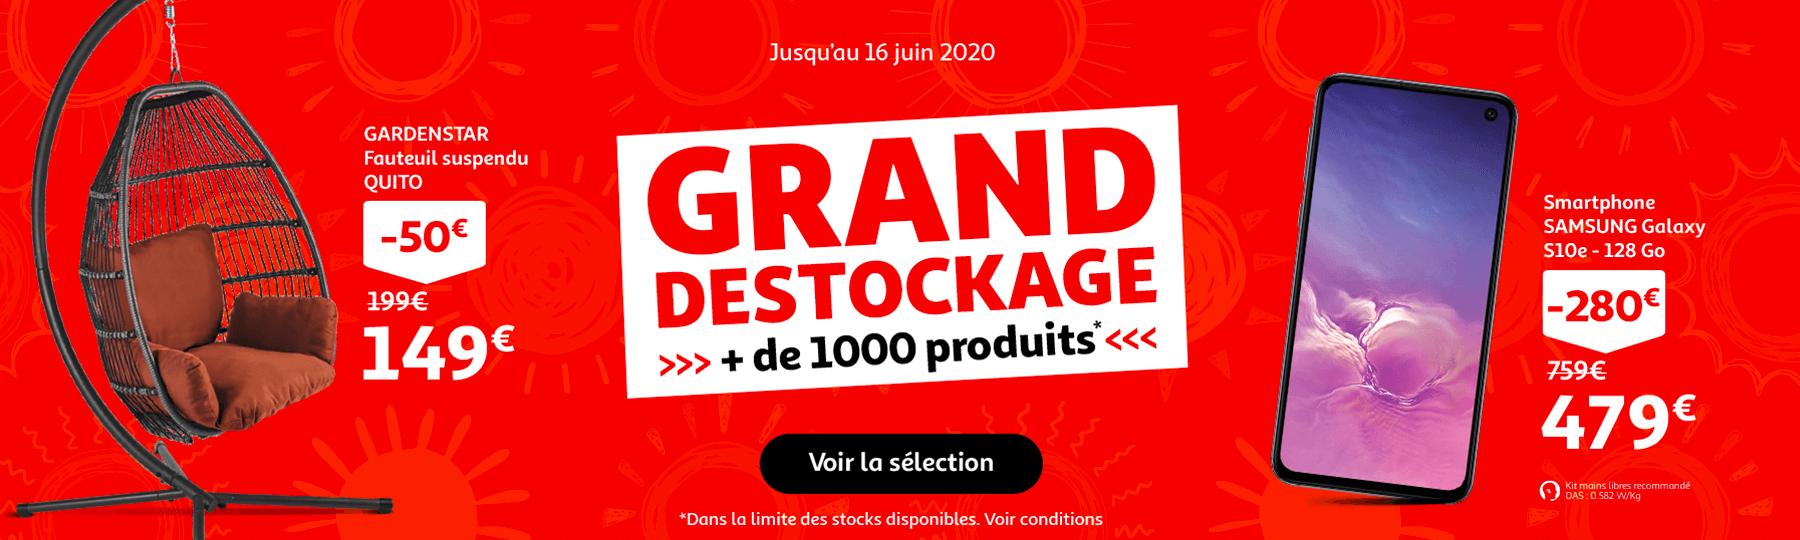 Grand destockage, plus de 1000 produits, jusqu'au 16 juin 2020